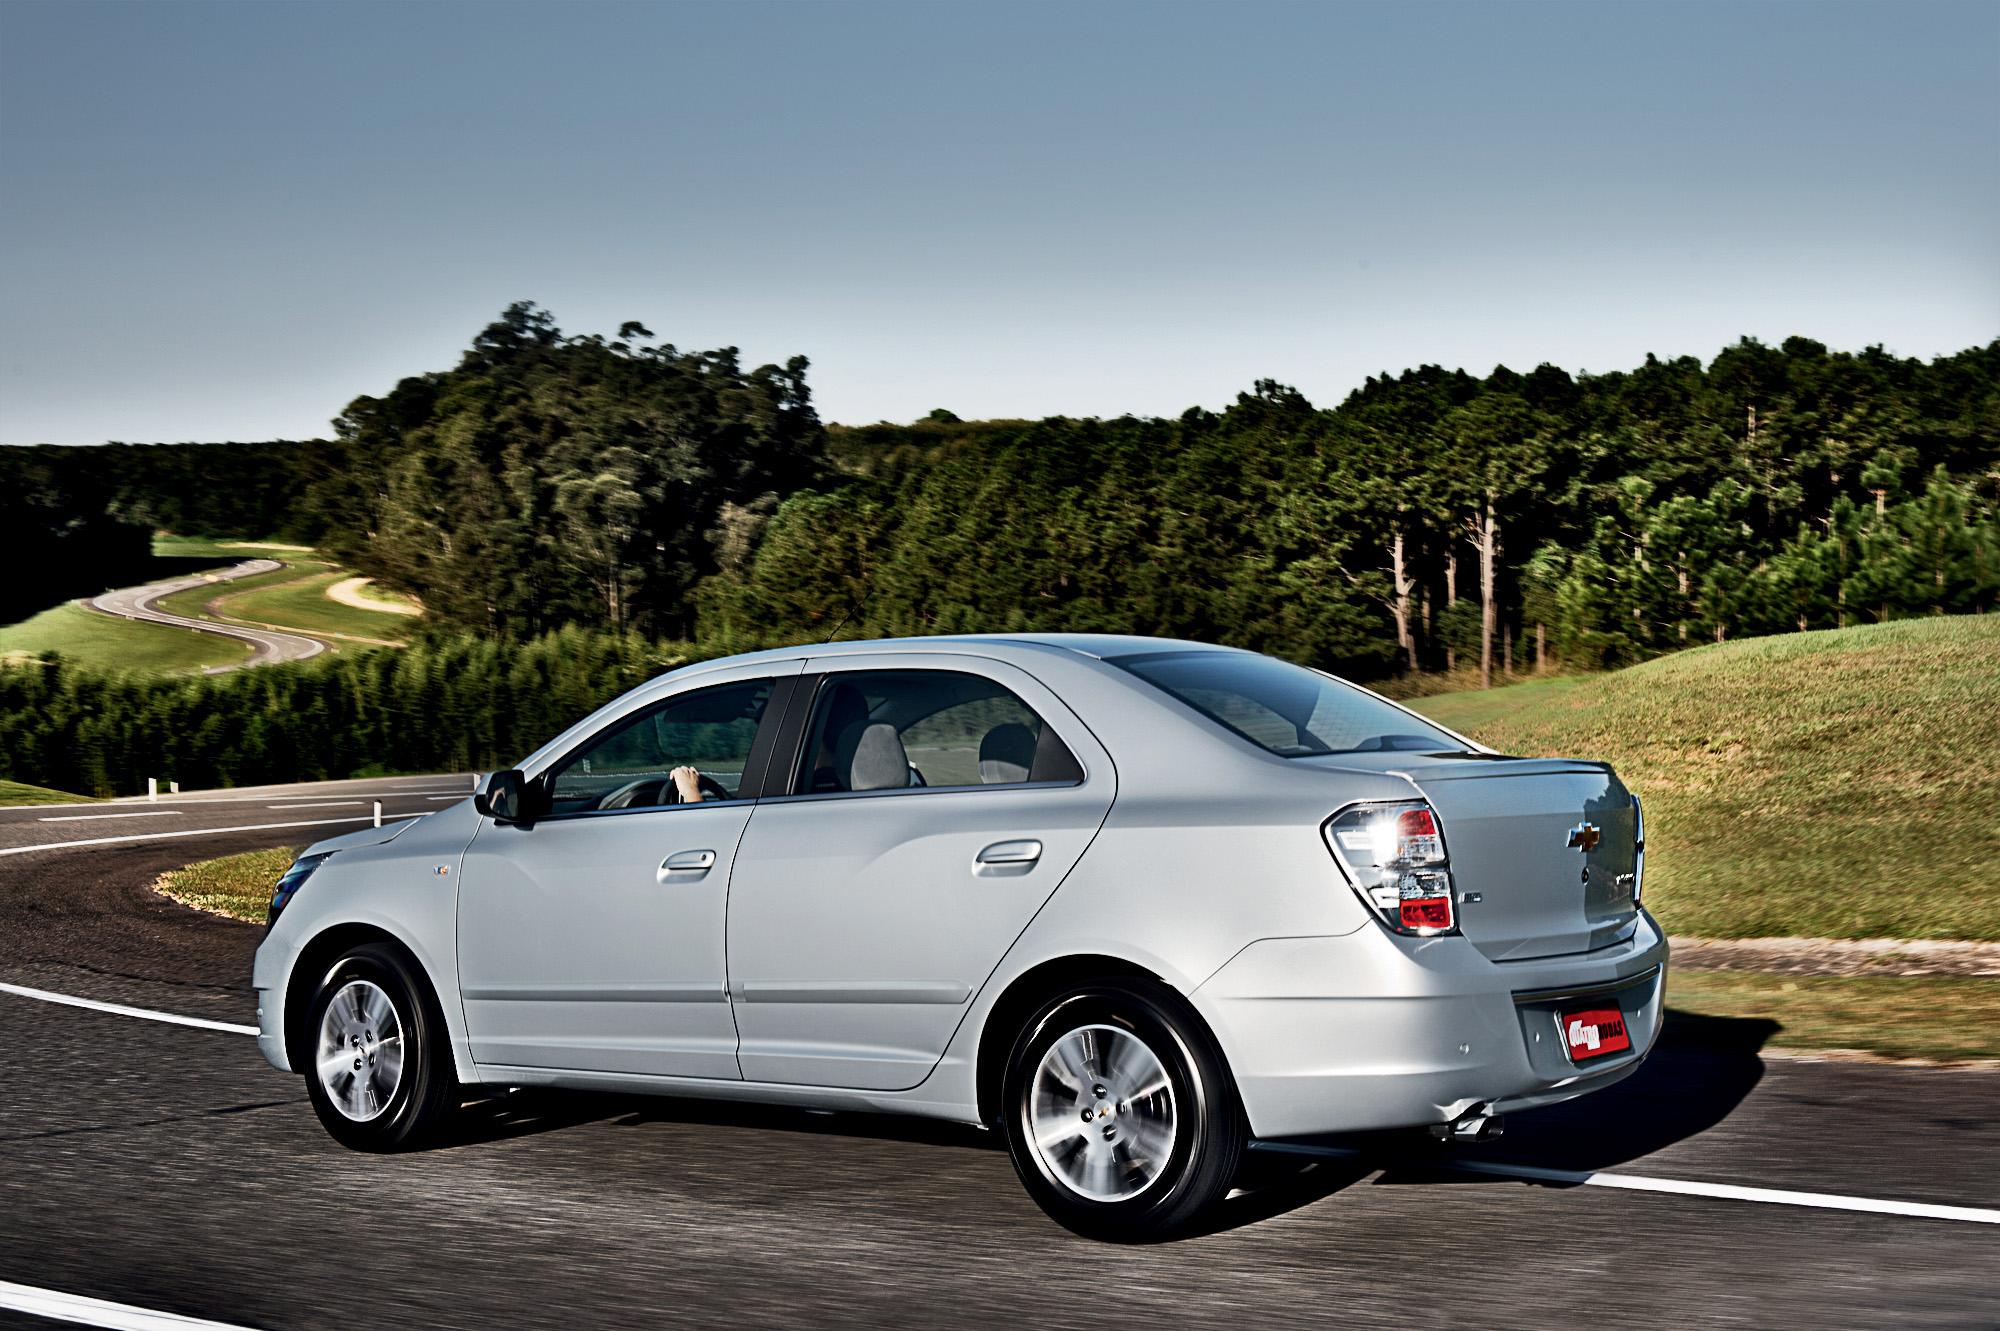 Chevrolet Cobalt LTZ 2012 02